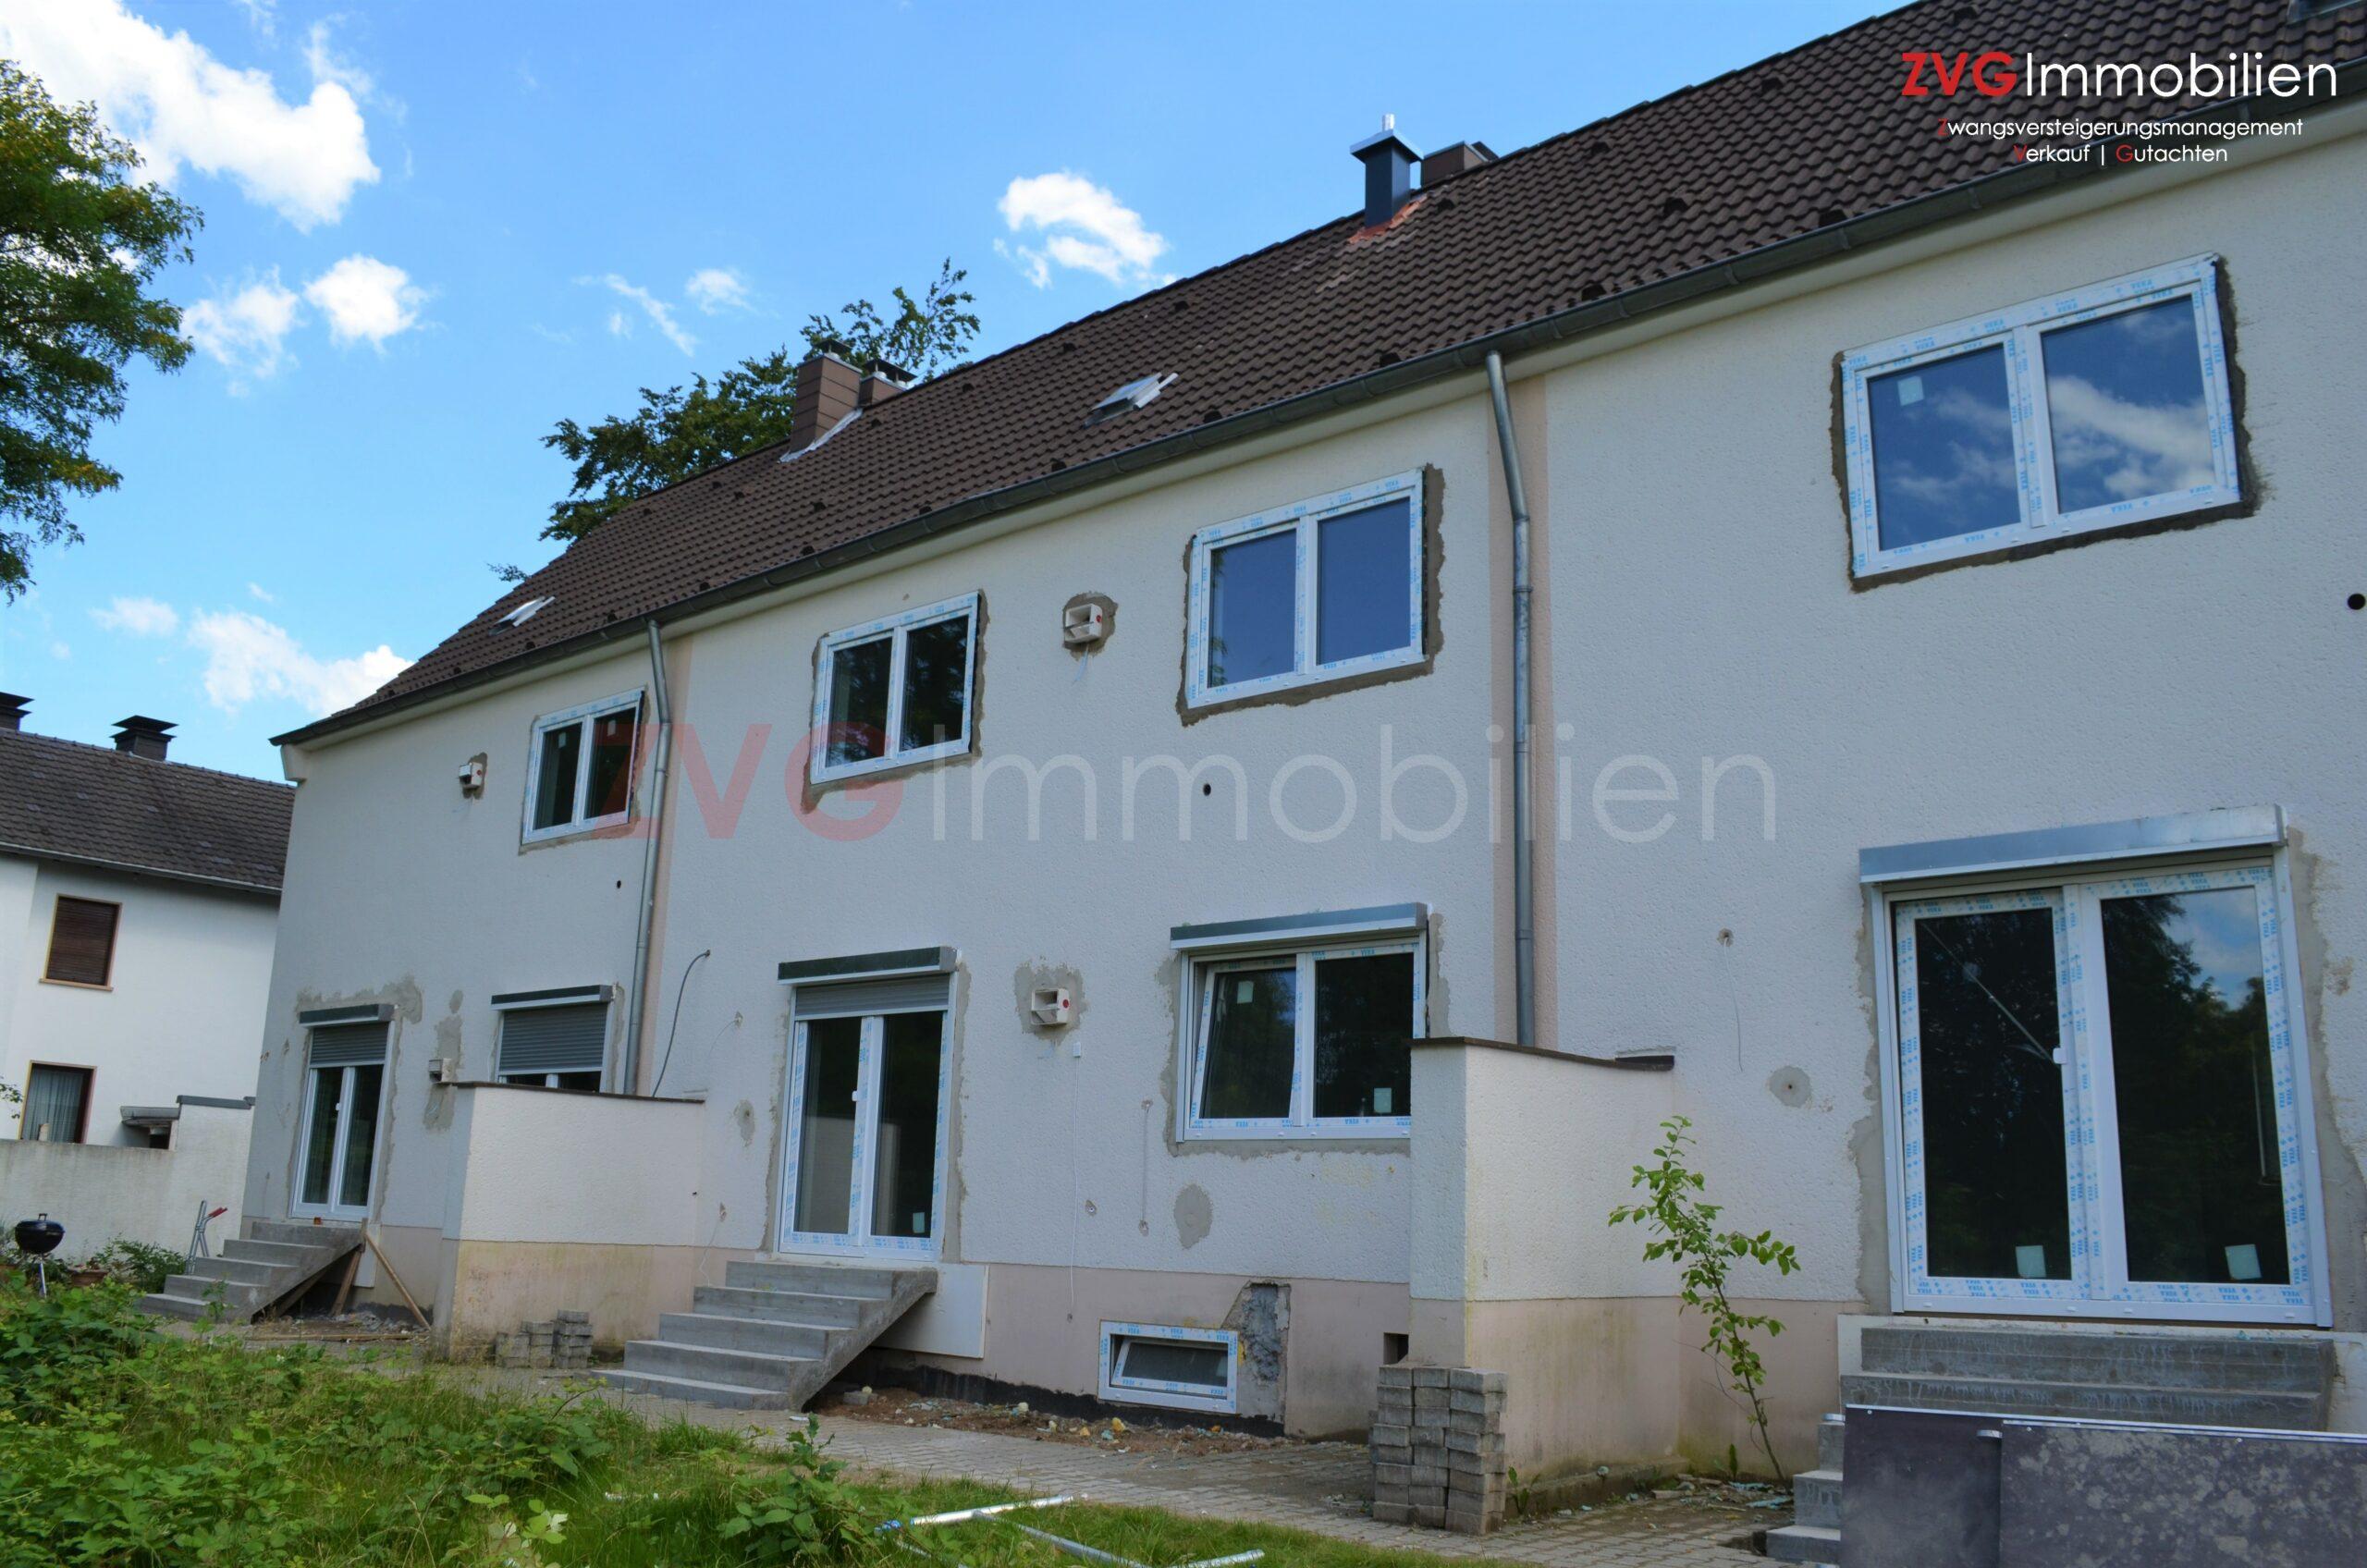 8 Insolvenzverkauf Mehrfamilienhäuser Köln